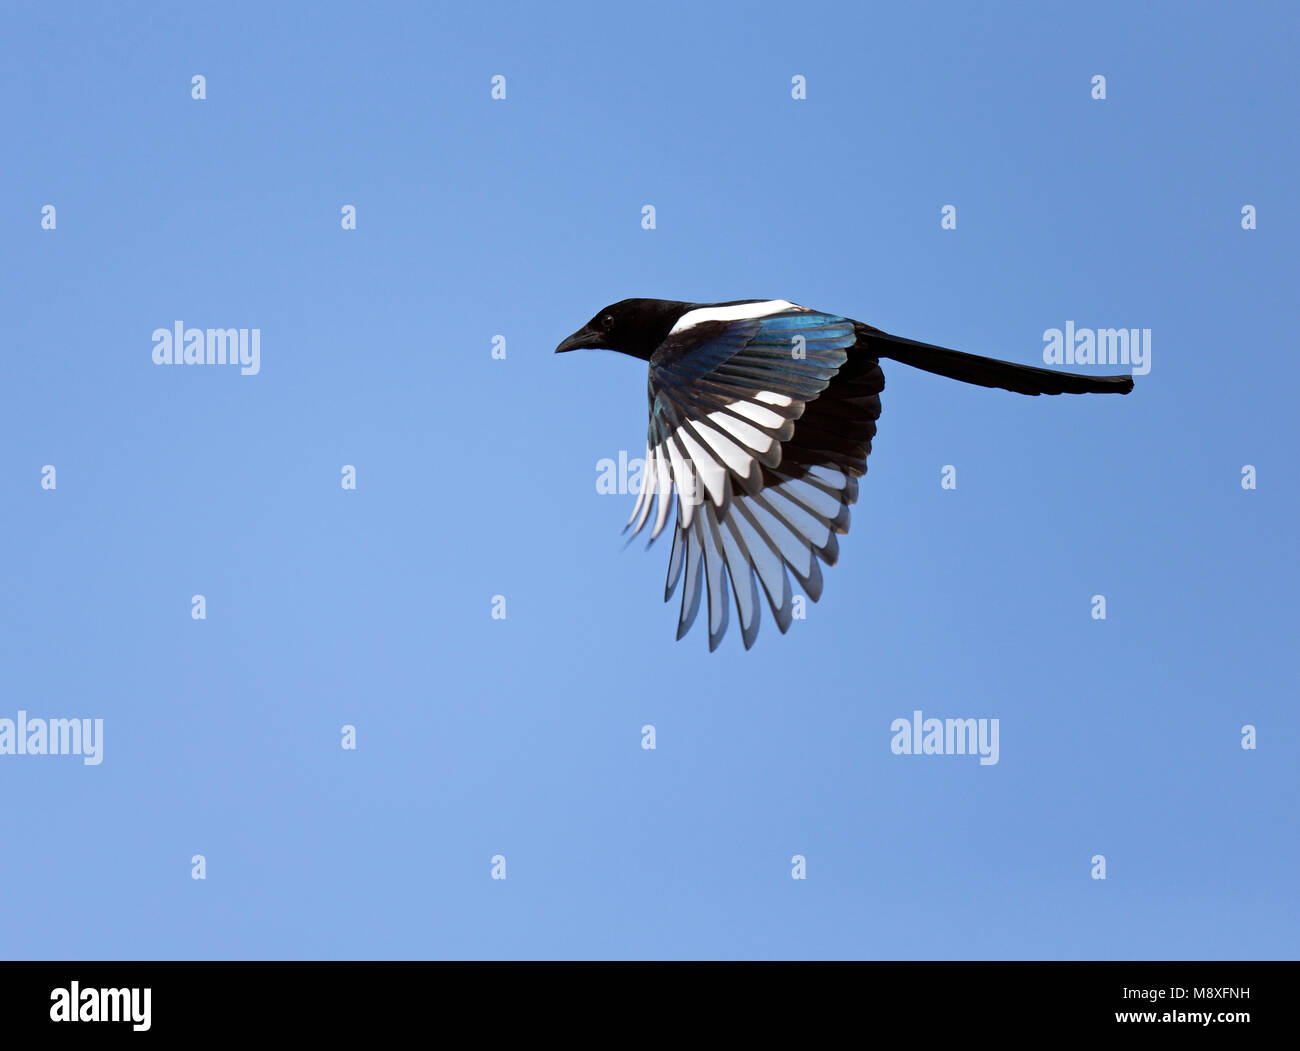 Ekster vliegend in de blauwe lucht;Flying Common Magpie against blue sky Stock Photo